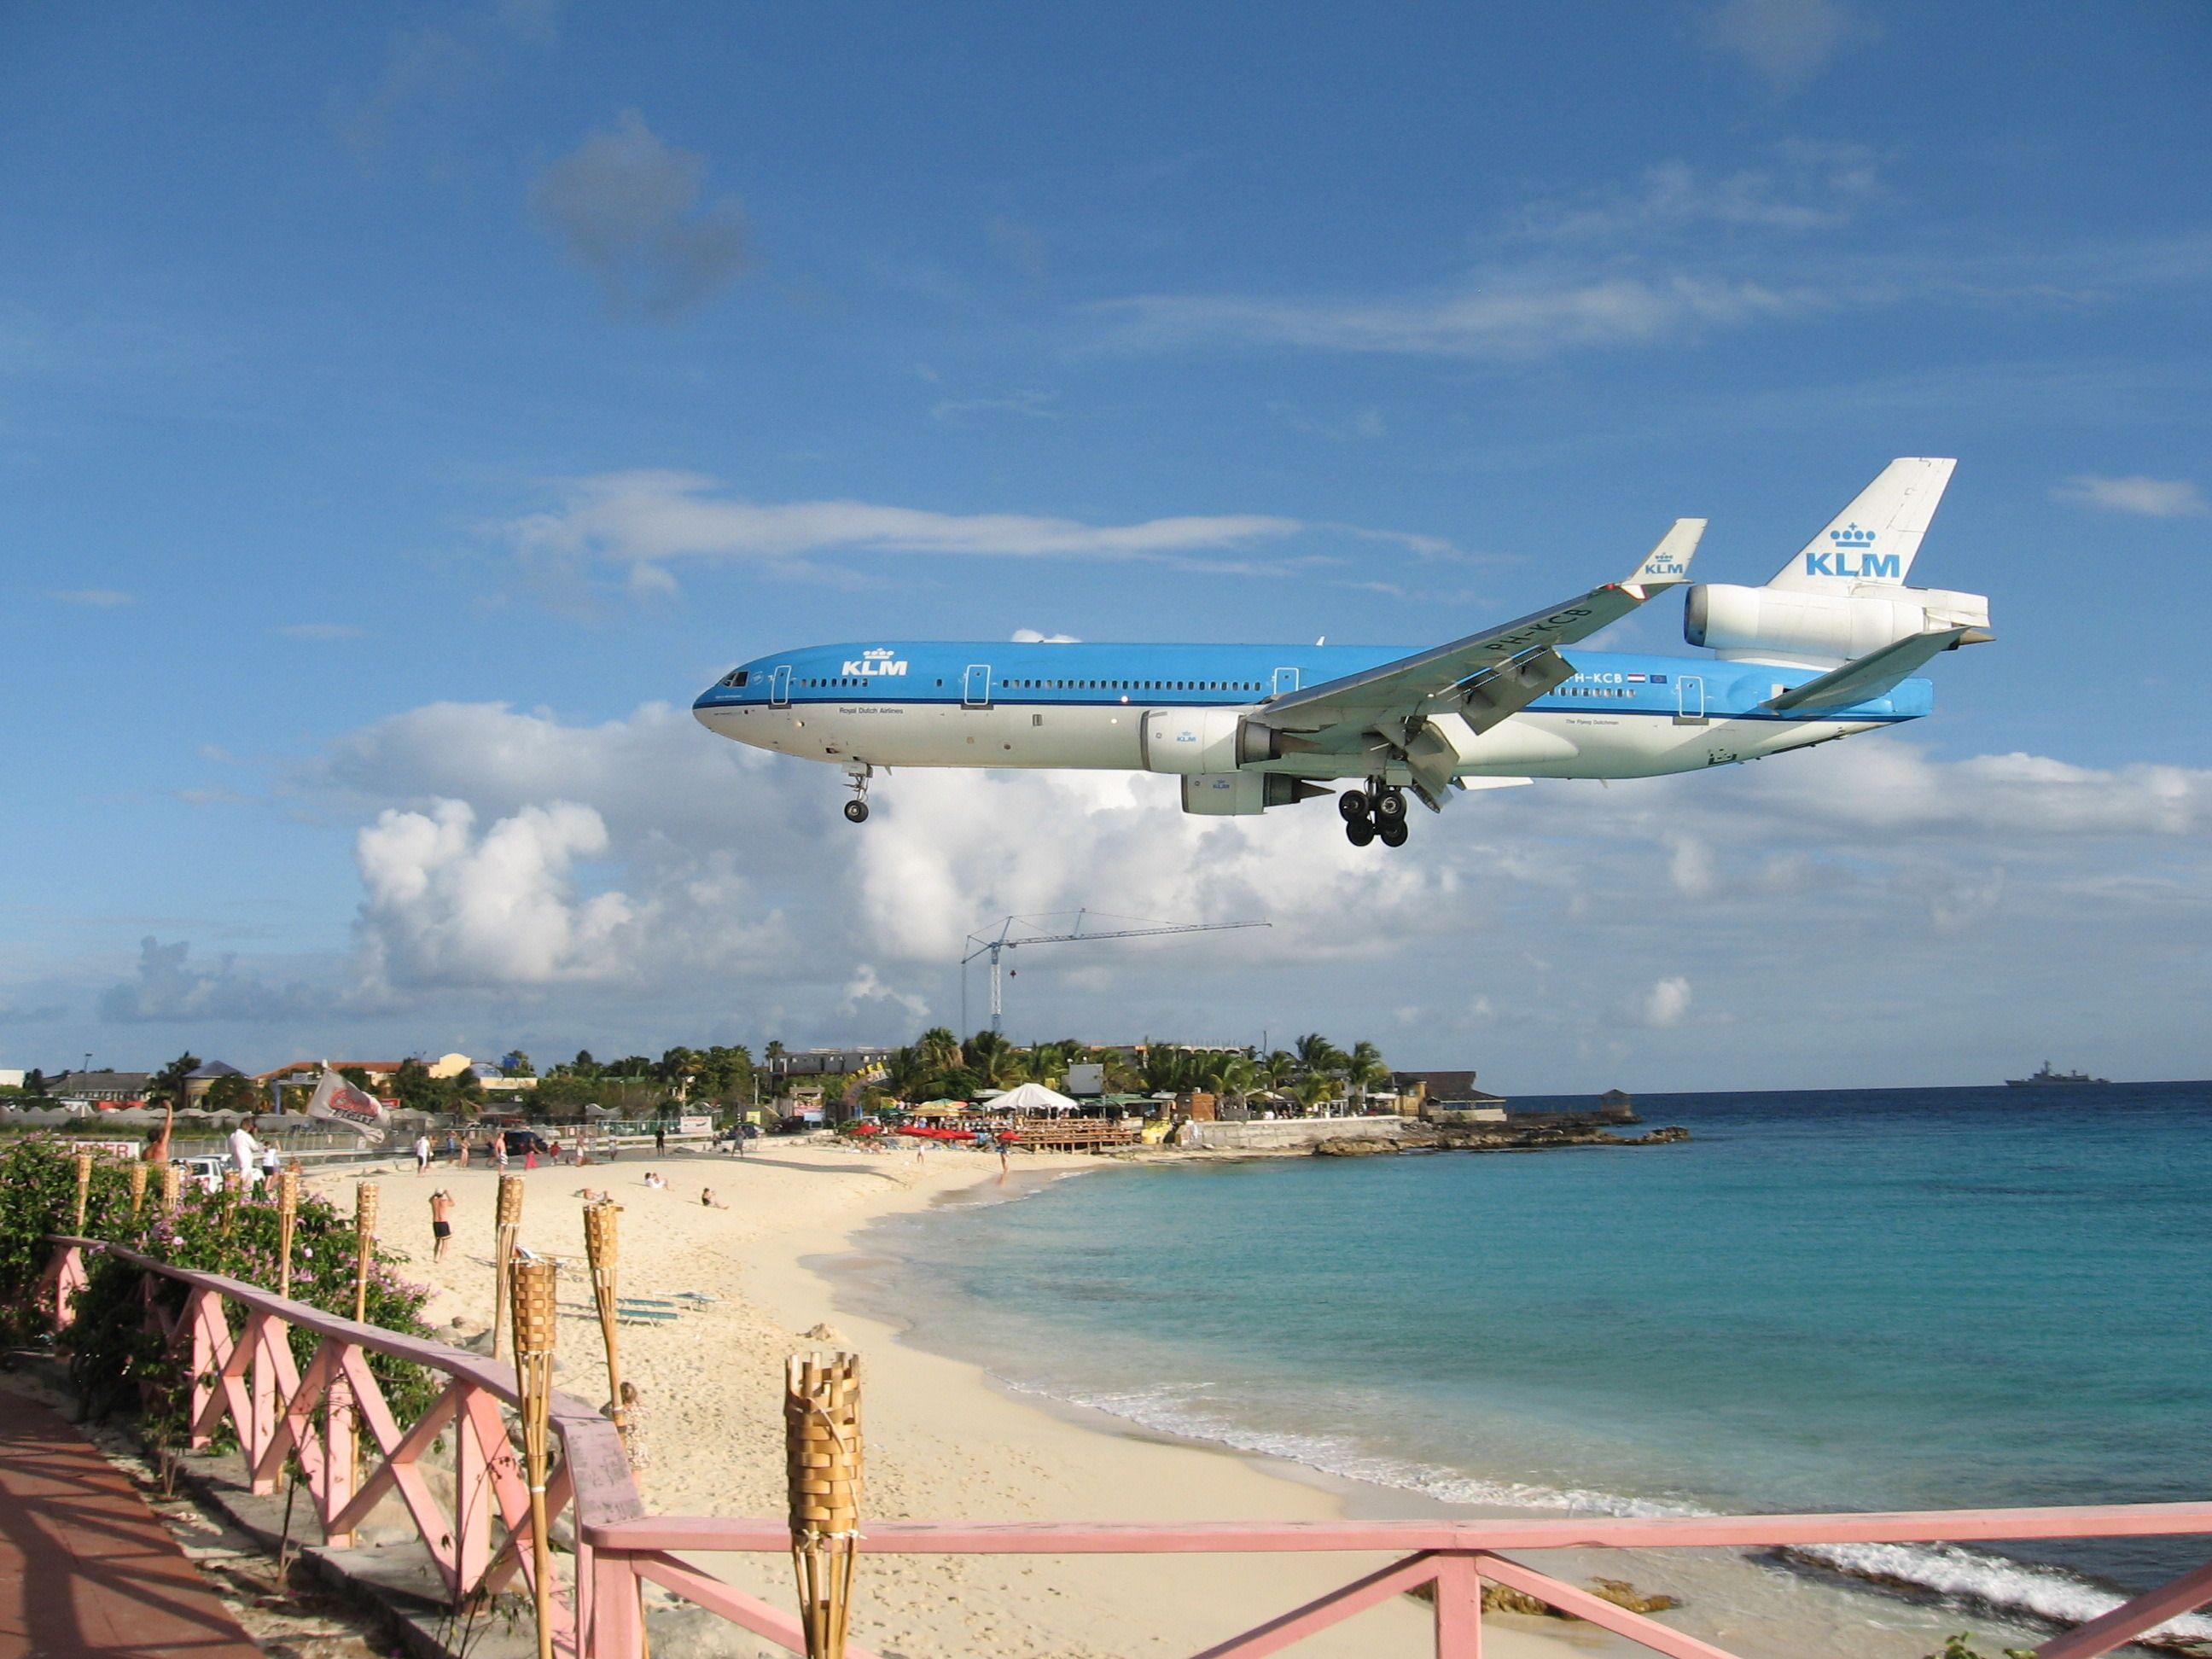 Planes landing at the Princess Juliana Airport, St. Maarten - KLM MD-11.